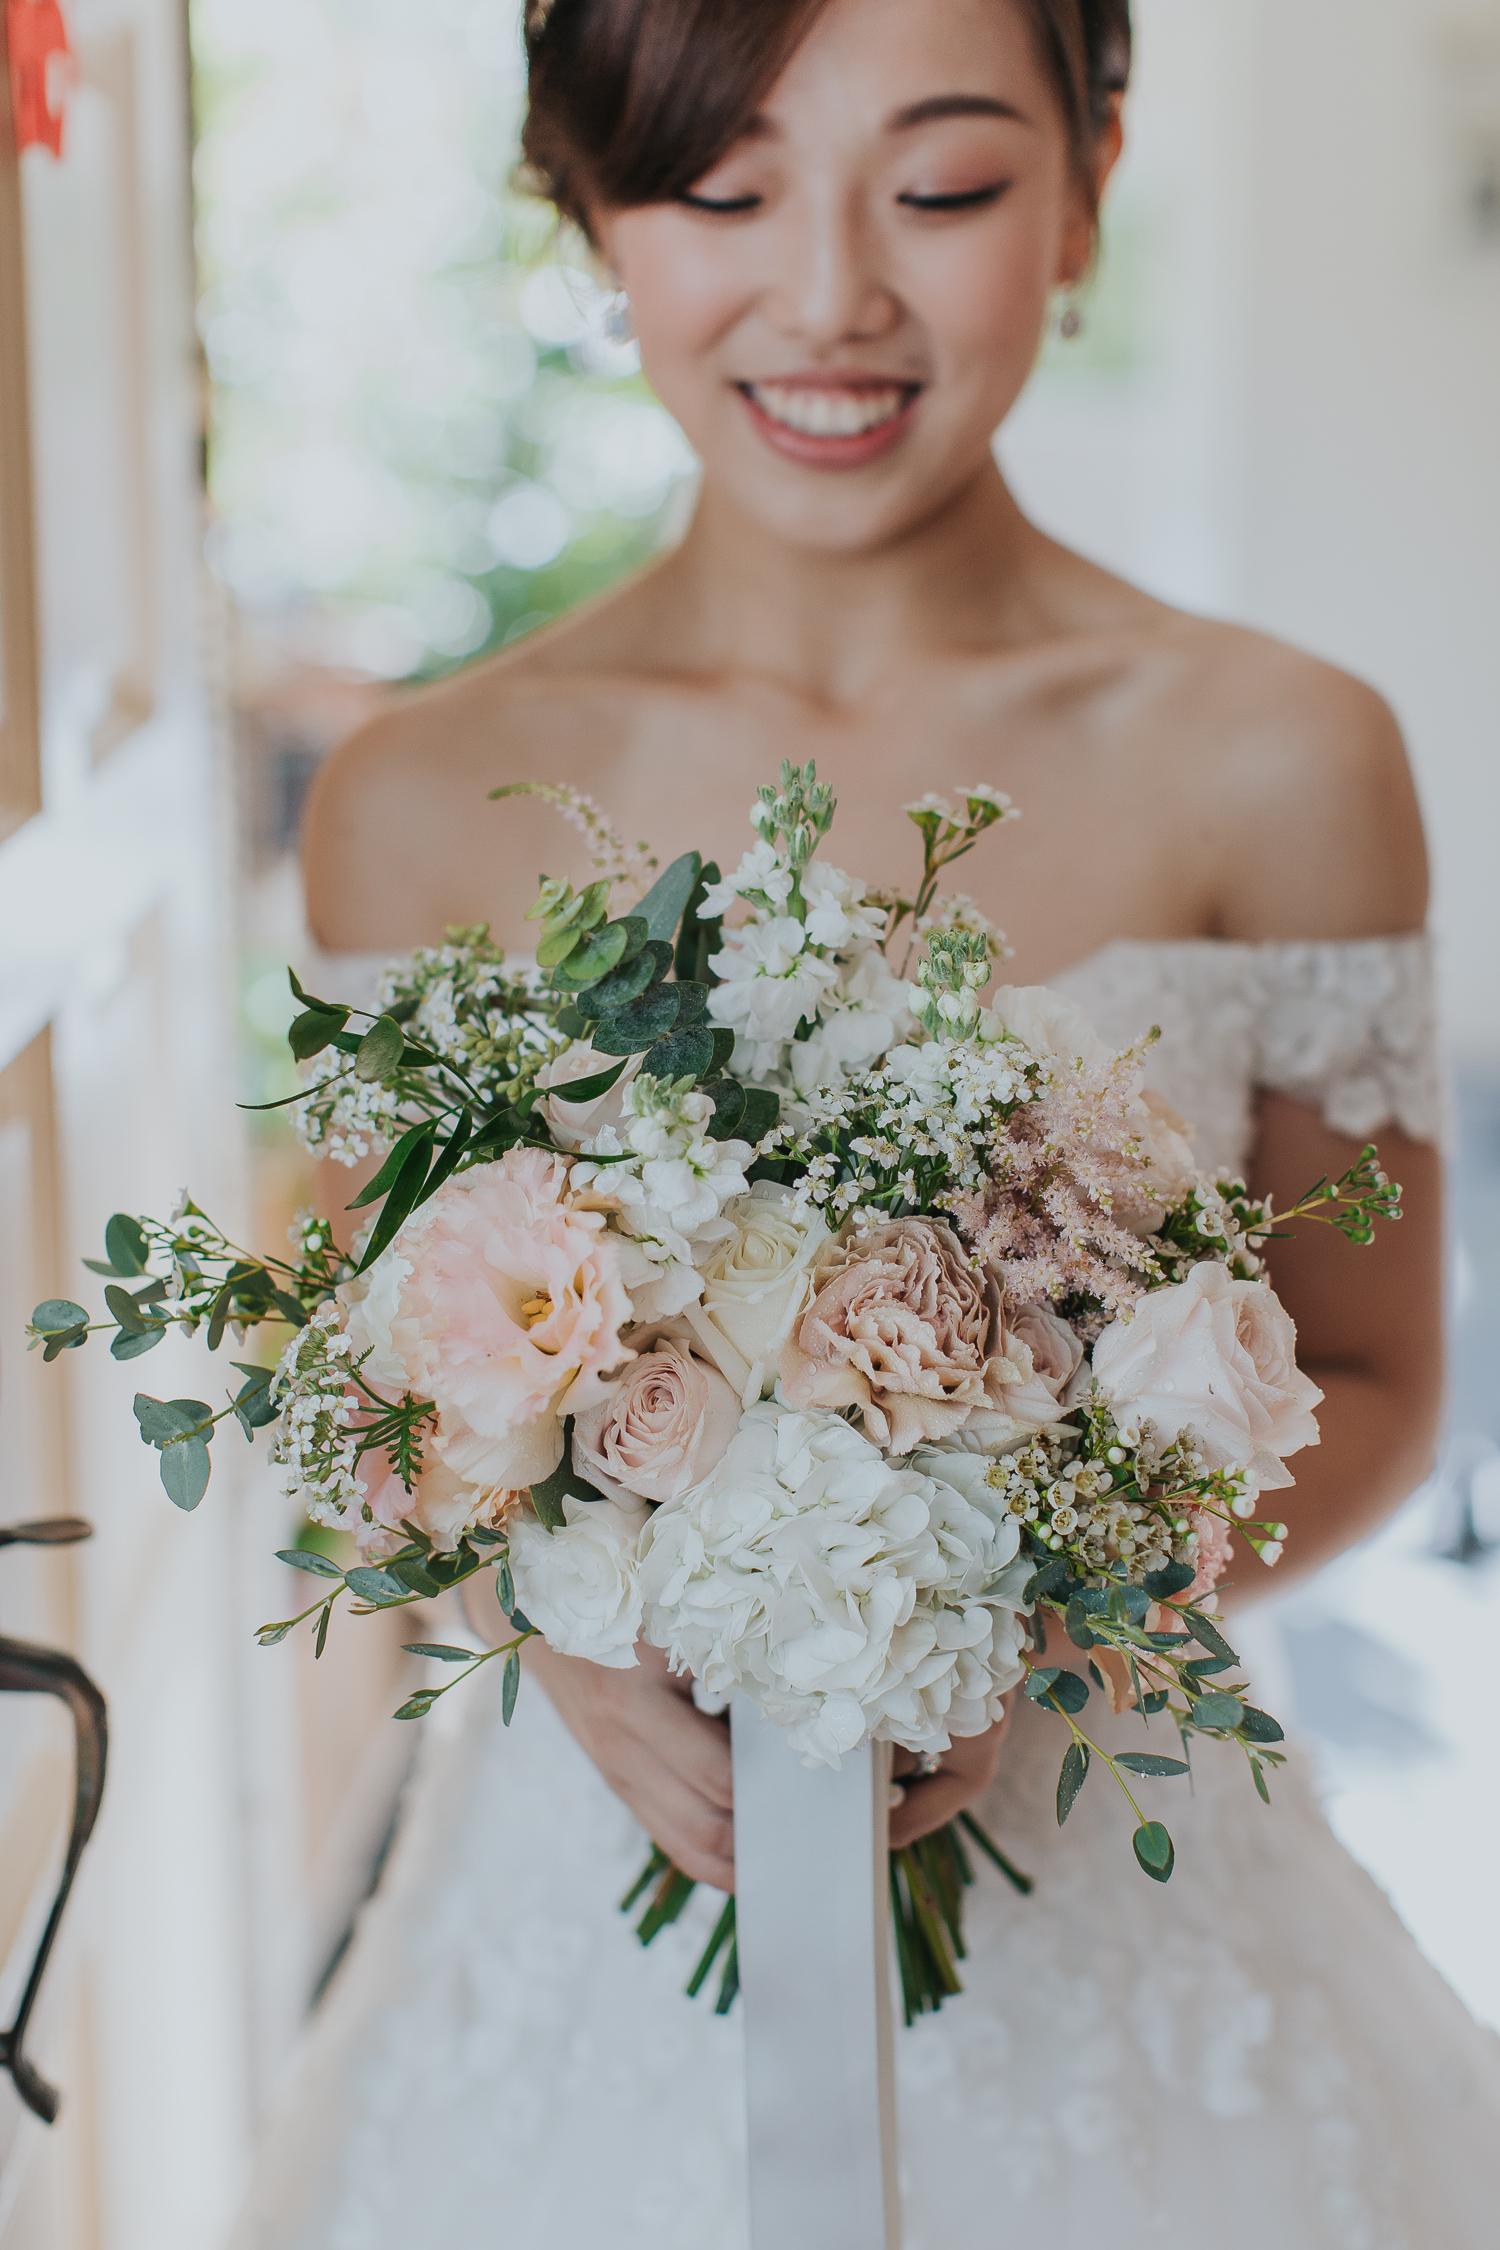 Singapore+Actual+Day+Wedding+Photographer+Grand+Mercure+Oliver+Estelle-0036.jpg